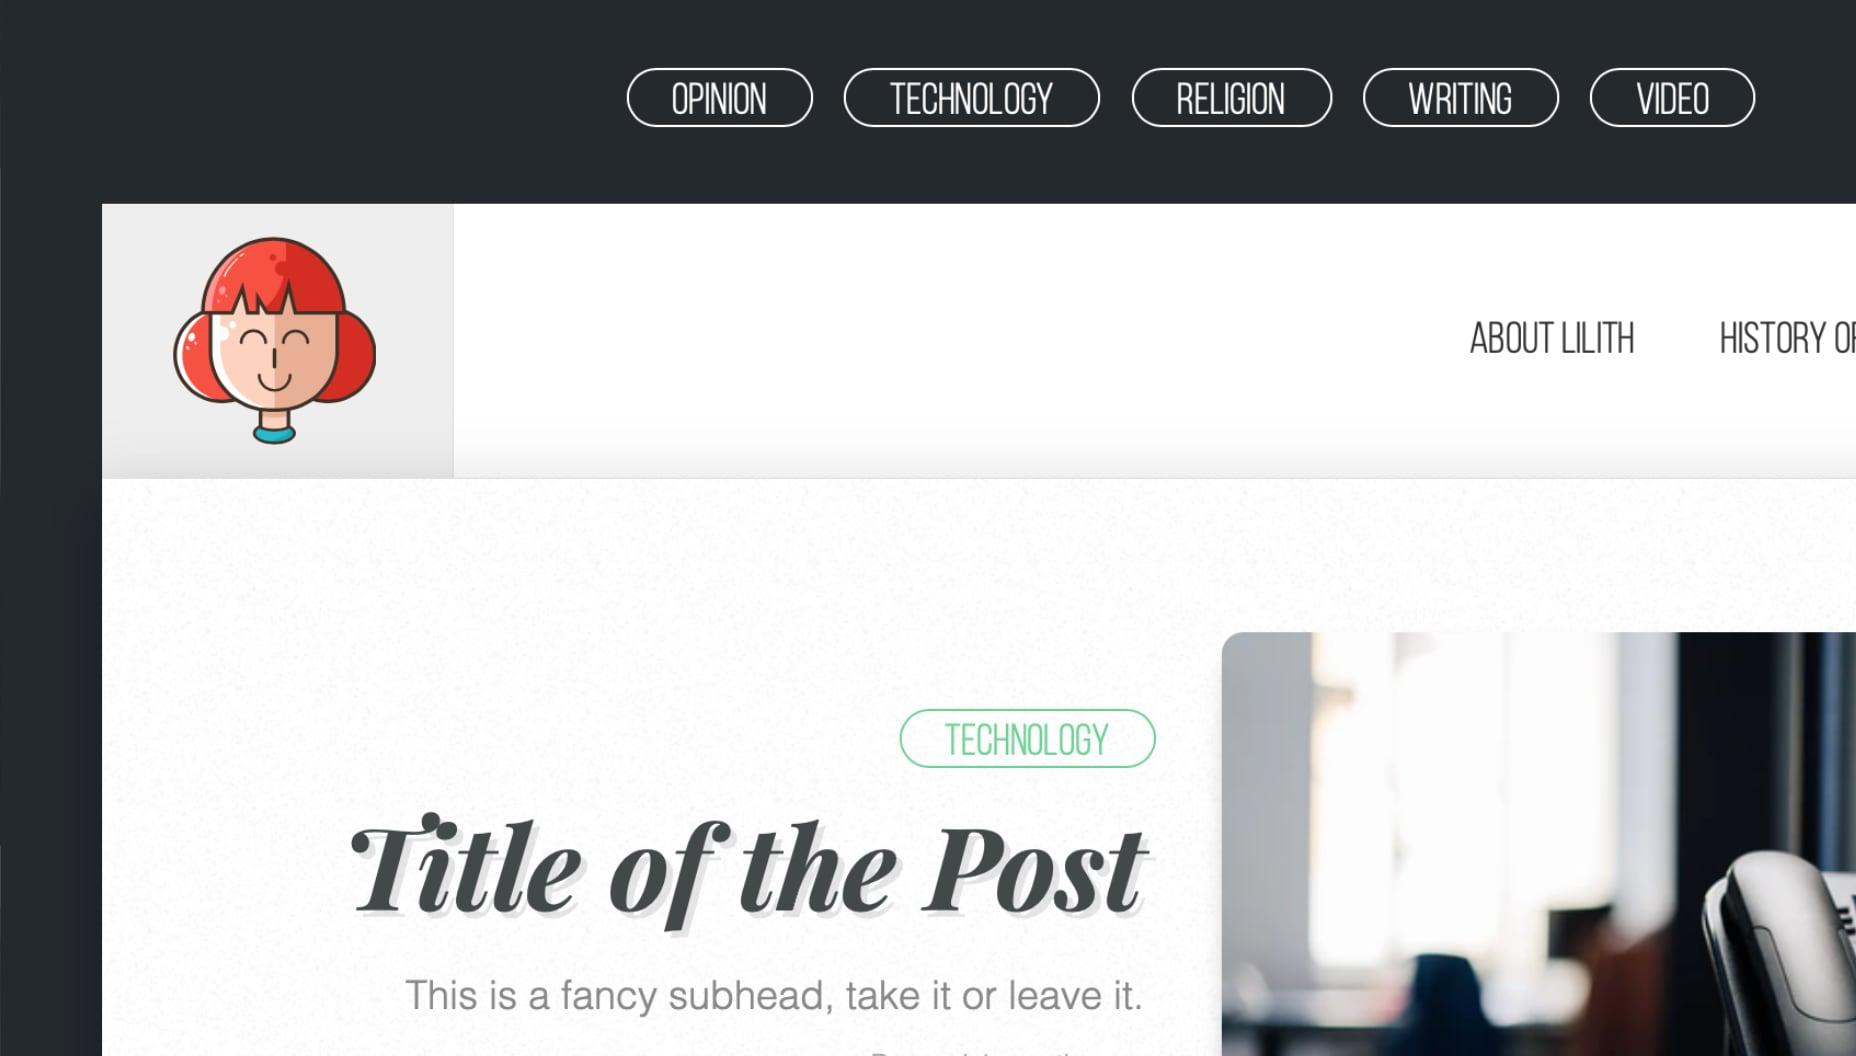 Example image of desktop layout